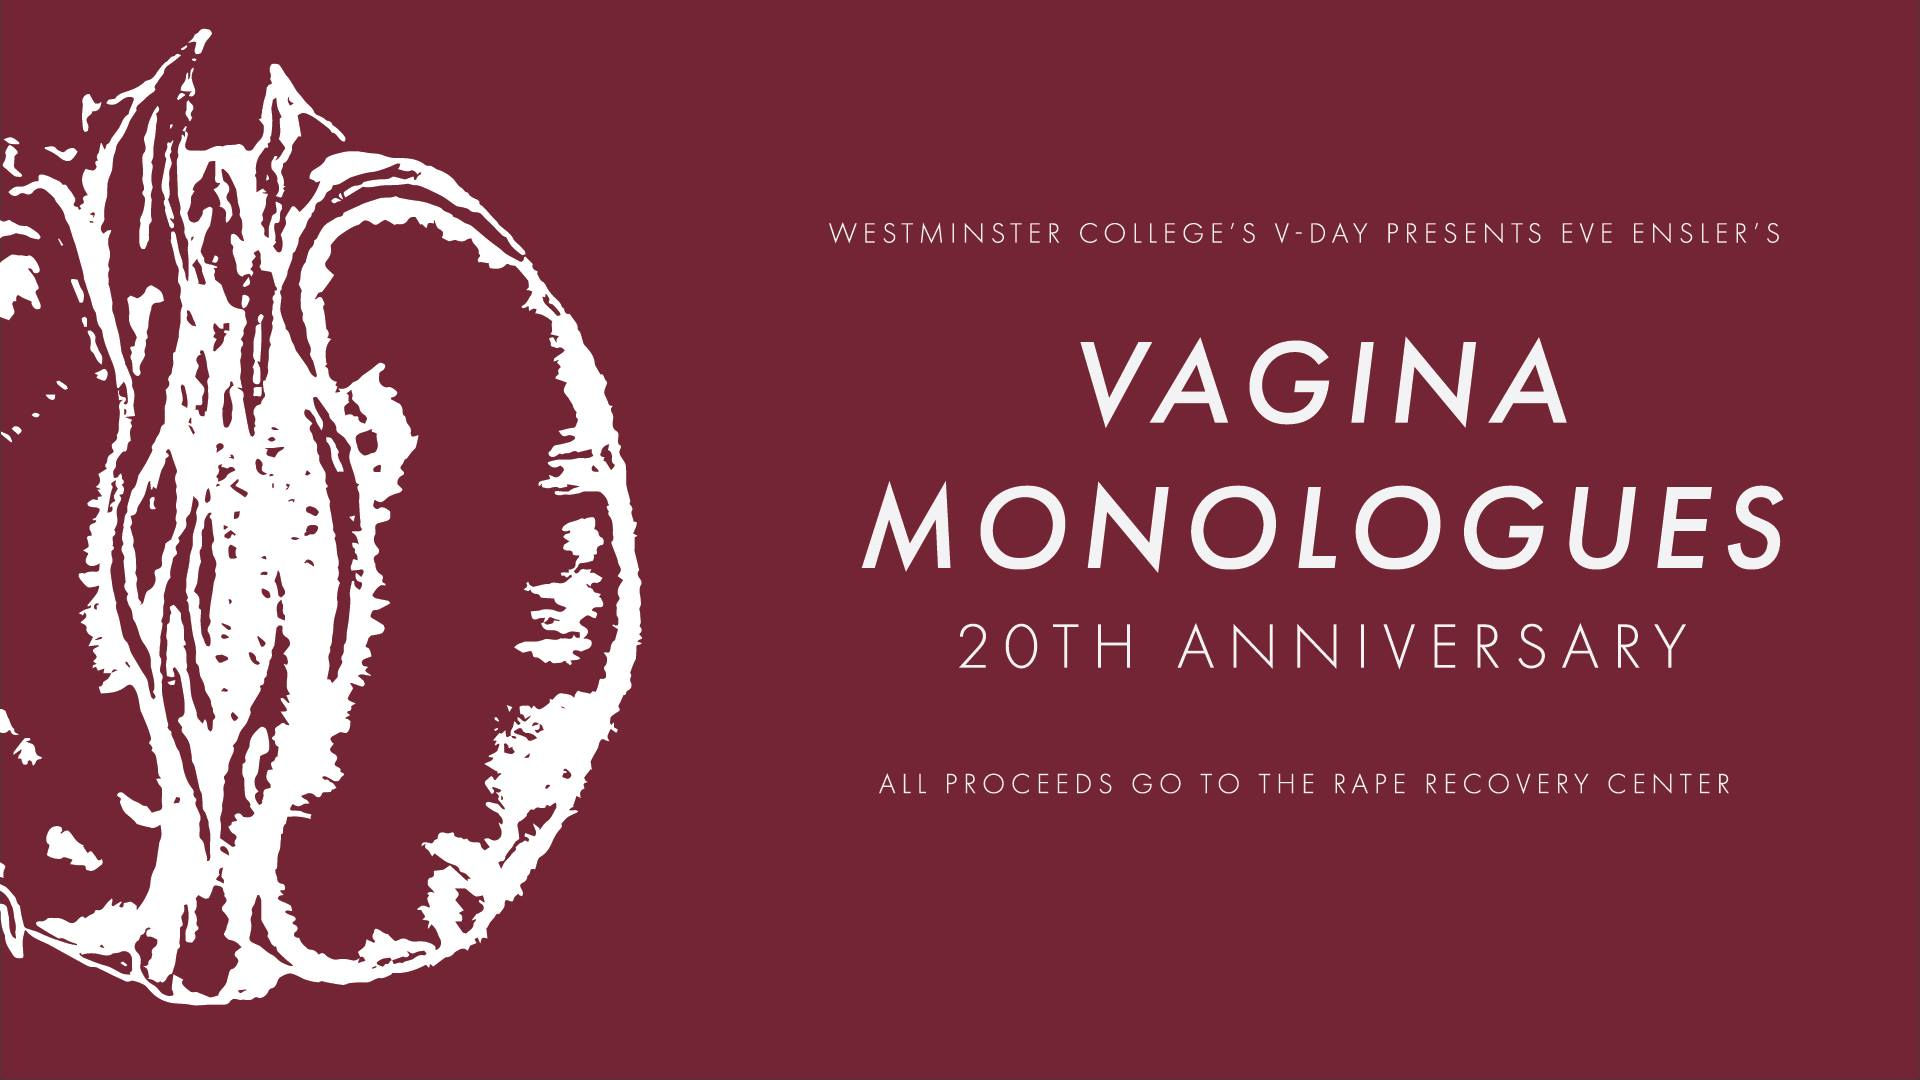 Vagina-Monologues.jpg